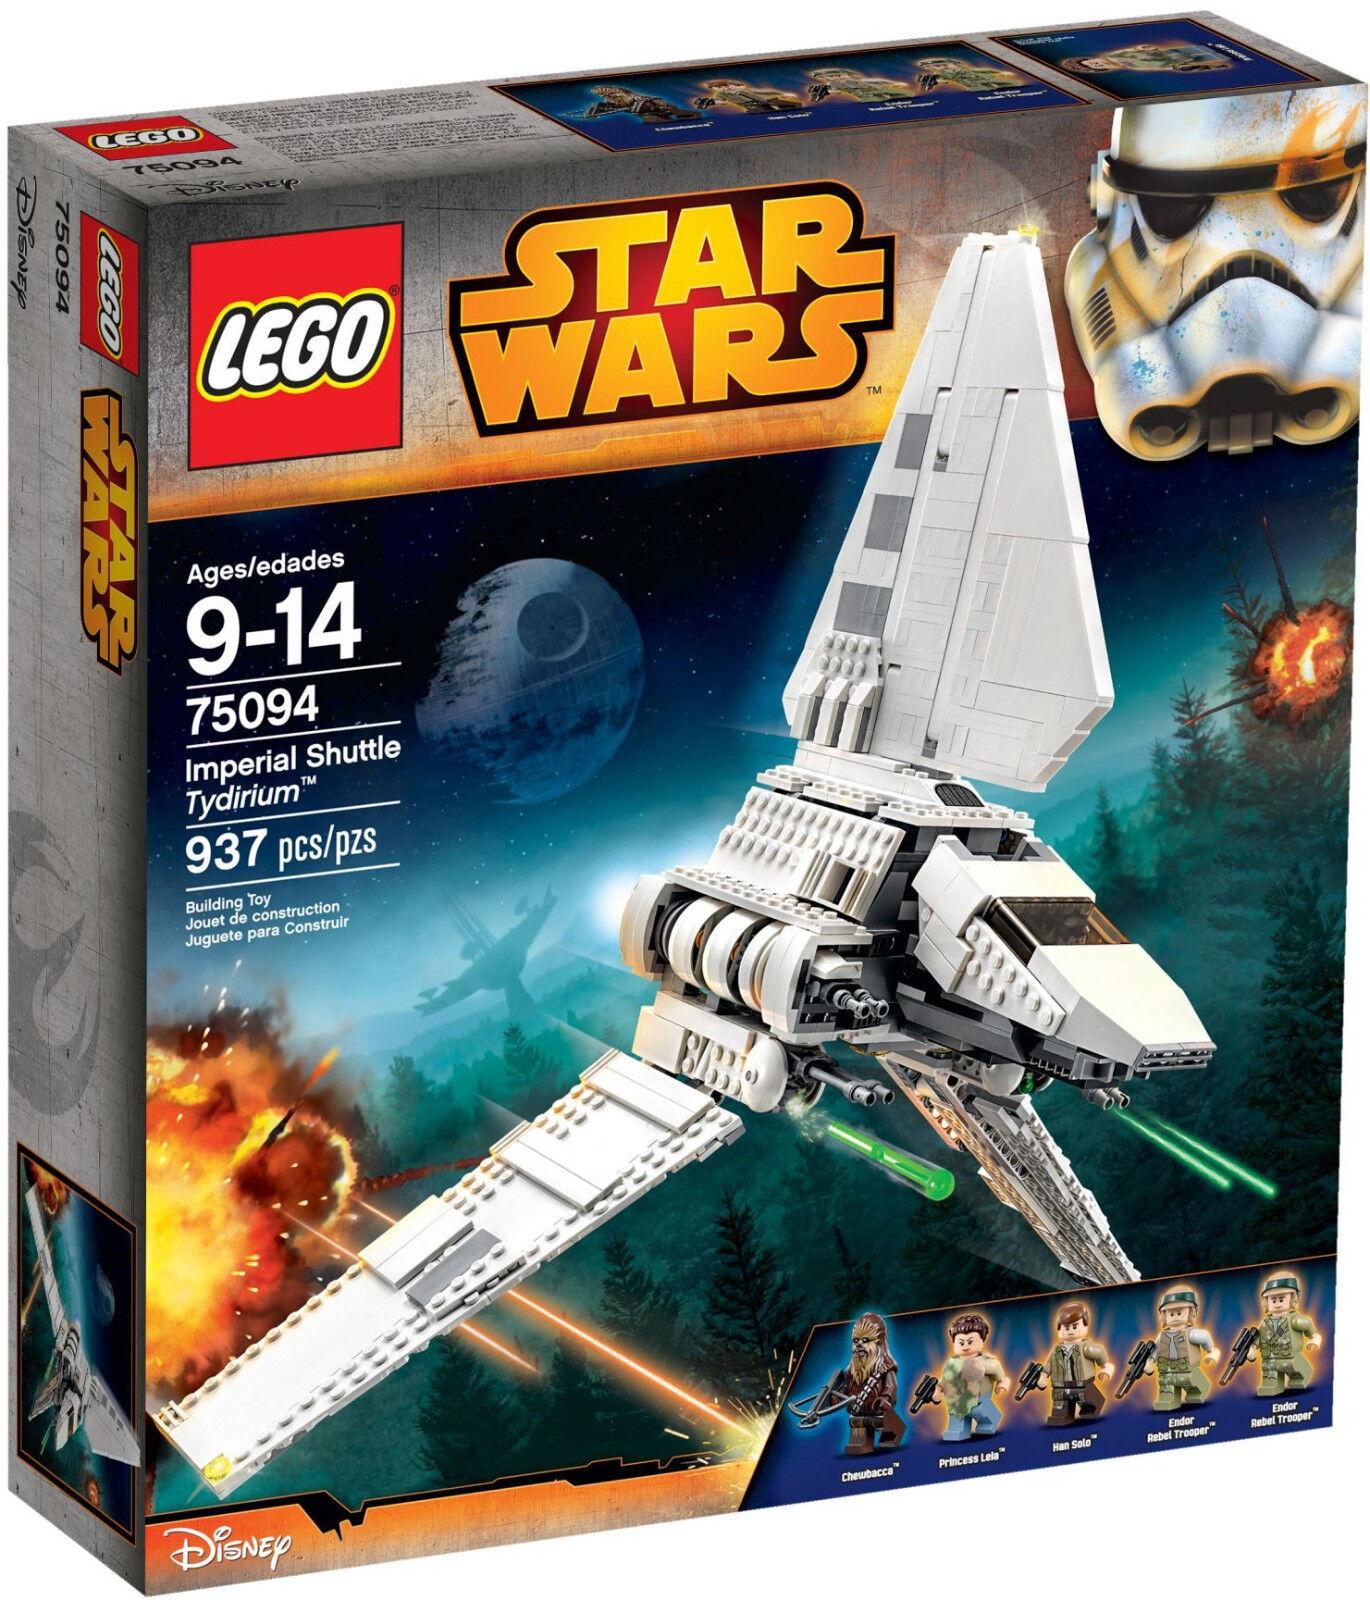 LEGO star wars - 75094 Imperial navette tydirium avec Leia & Han solo-NEUF & OVP